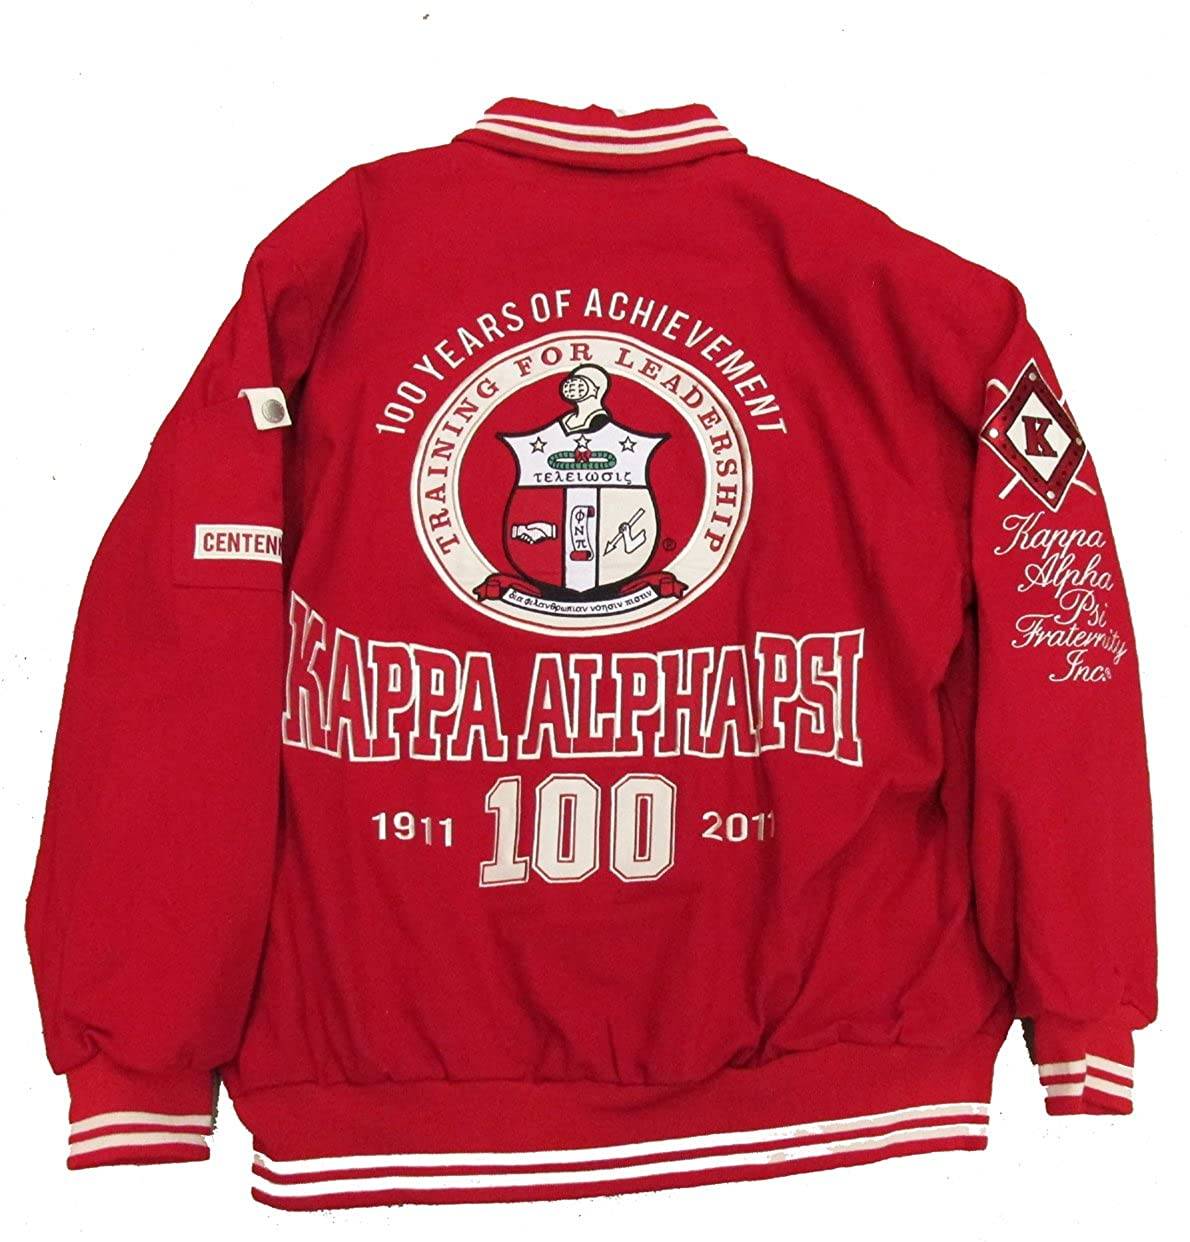 43ad774a77e Amazon.com  Kappa Alpha Psi Varsity Trimmed Fraternity Mens Big   Tall  Jacket  Clothing